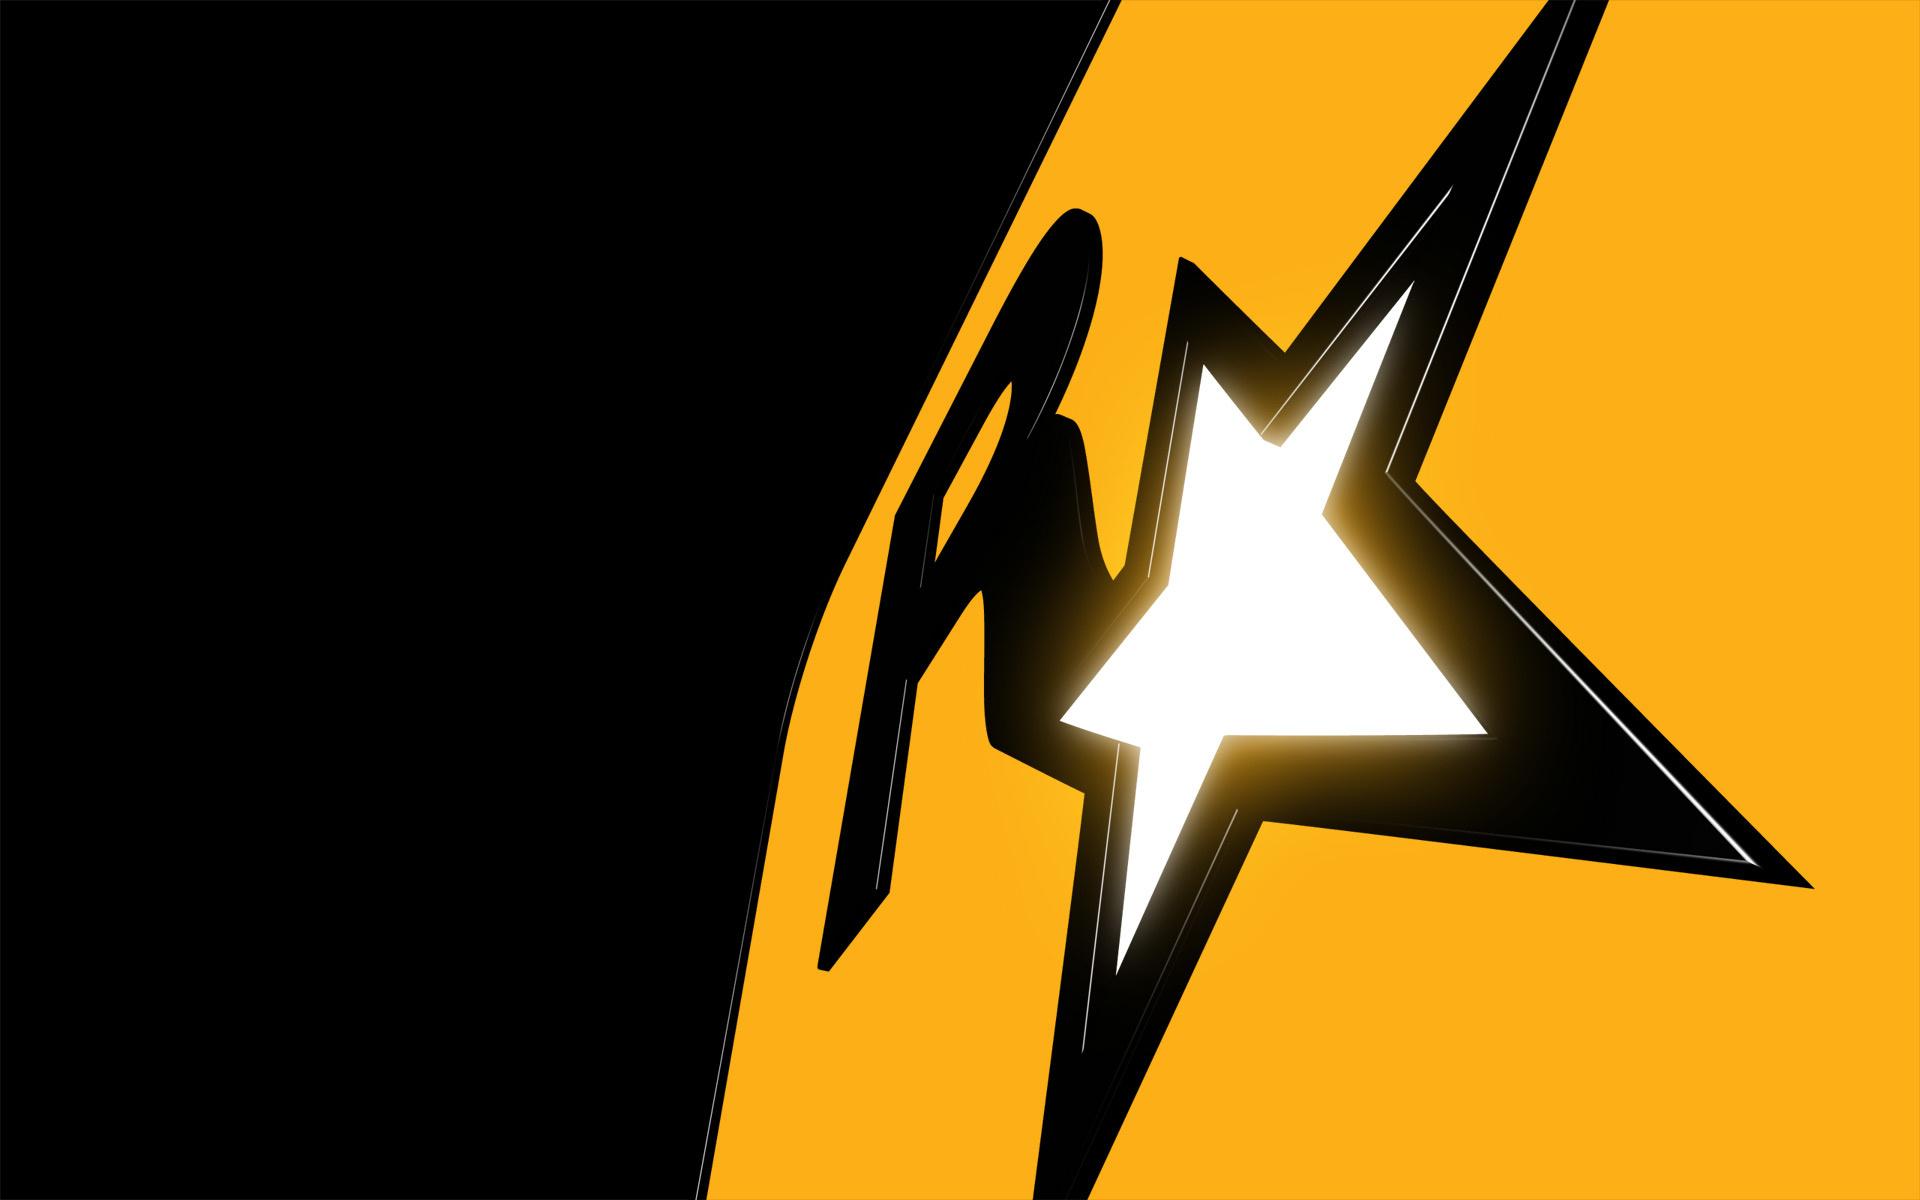 Надписи, картинки логотипы игр